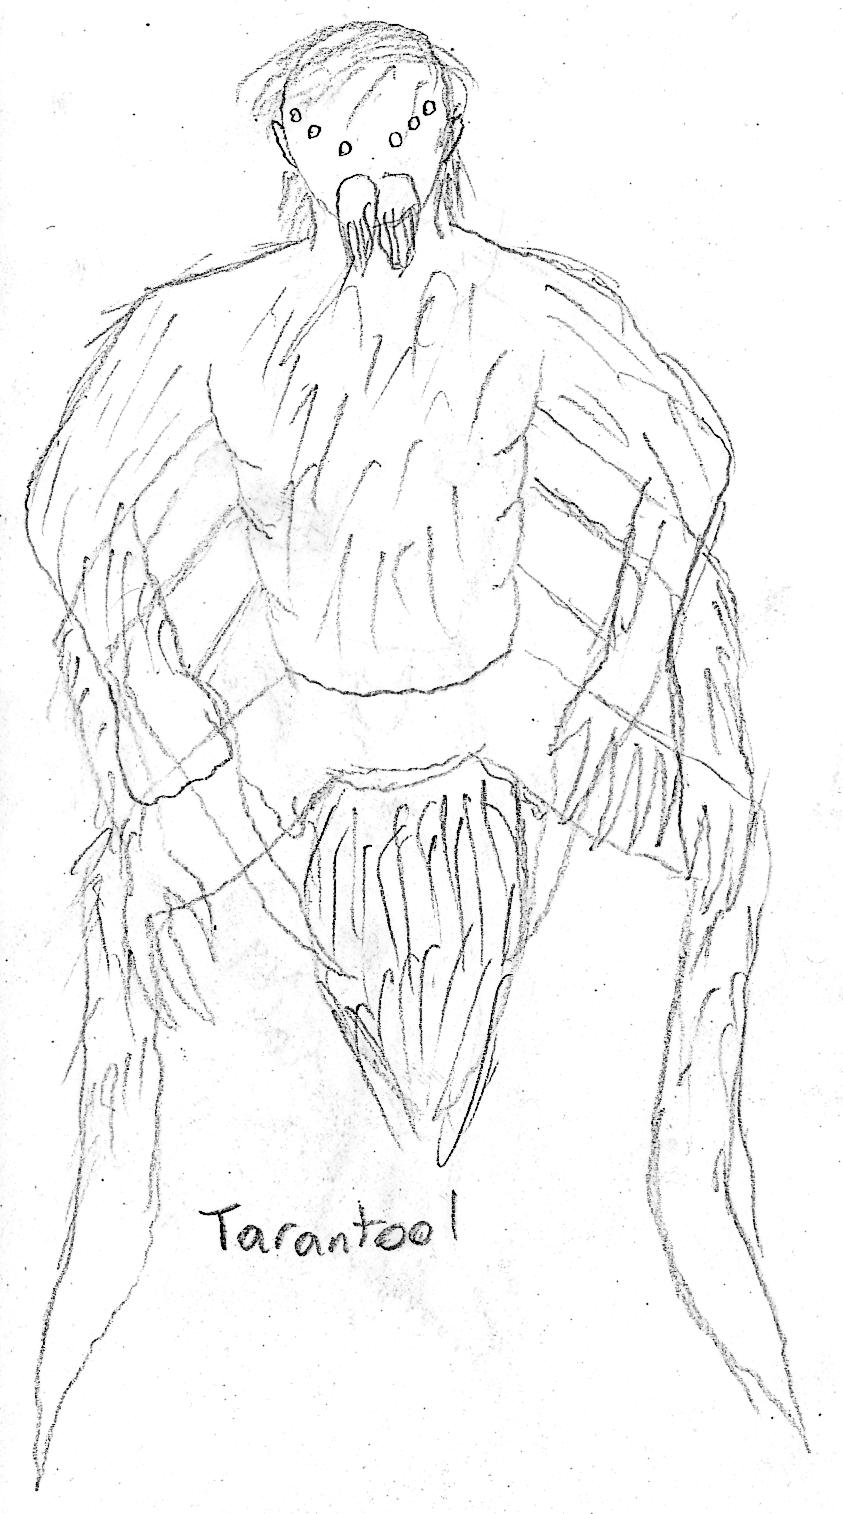 ShastaB24 character 16 - Tarantool